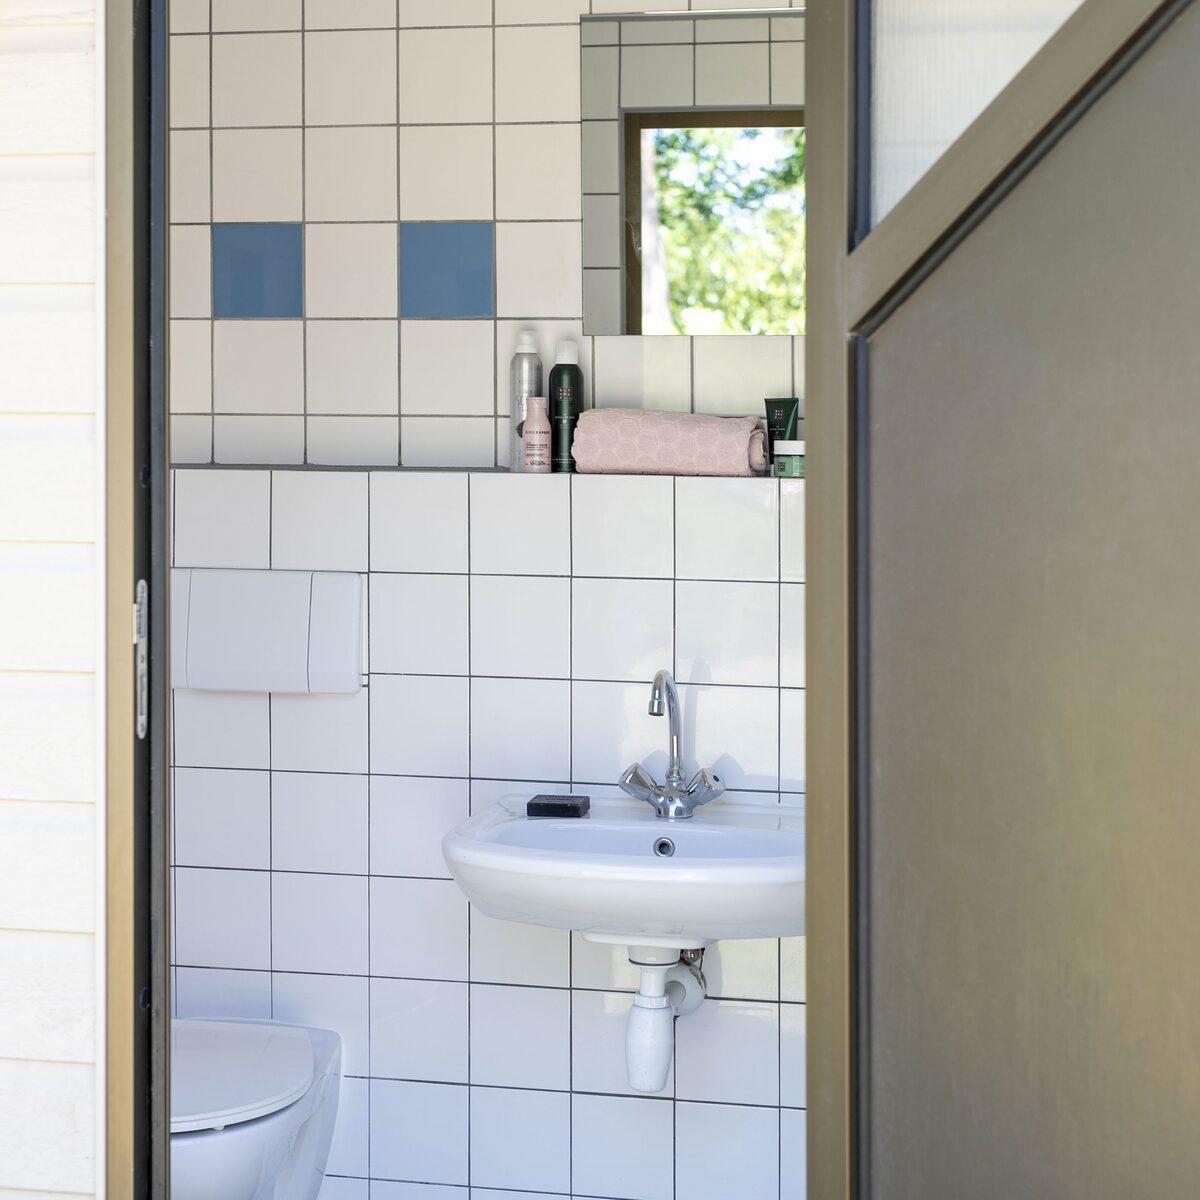 Witterzomer Kampeerplaats met privé sanitair Drenthe Assen